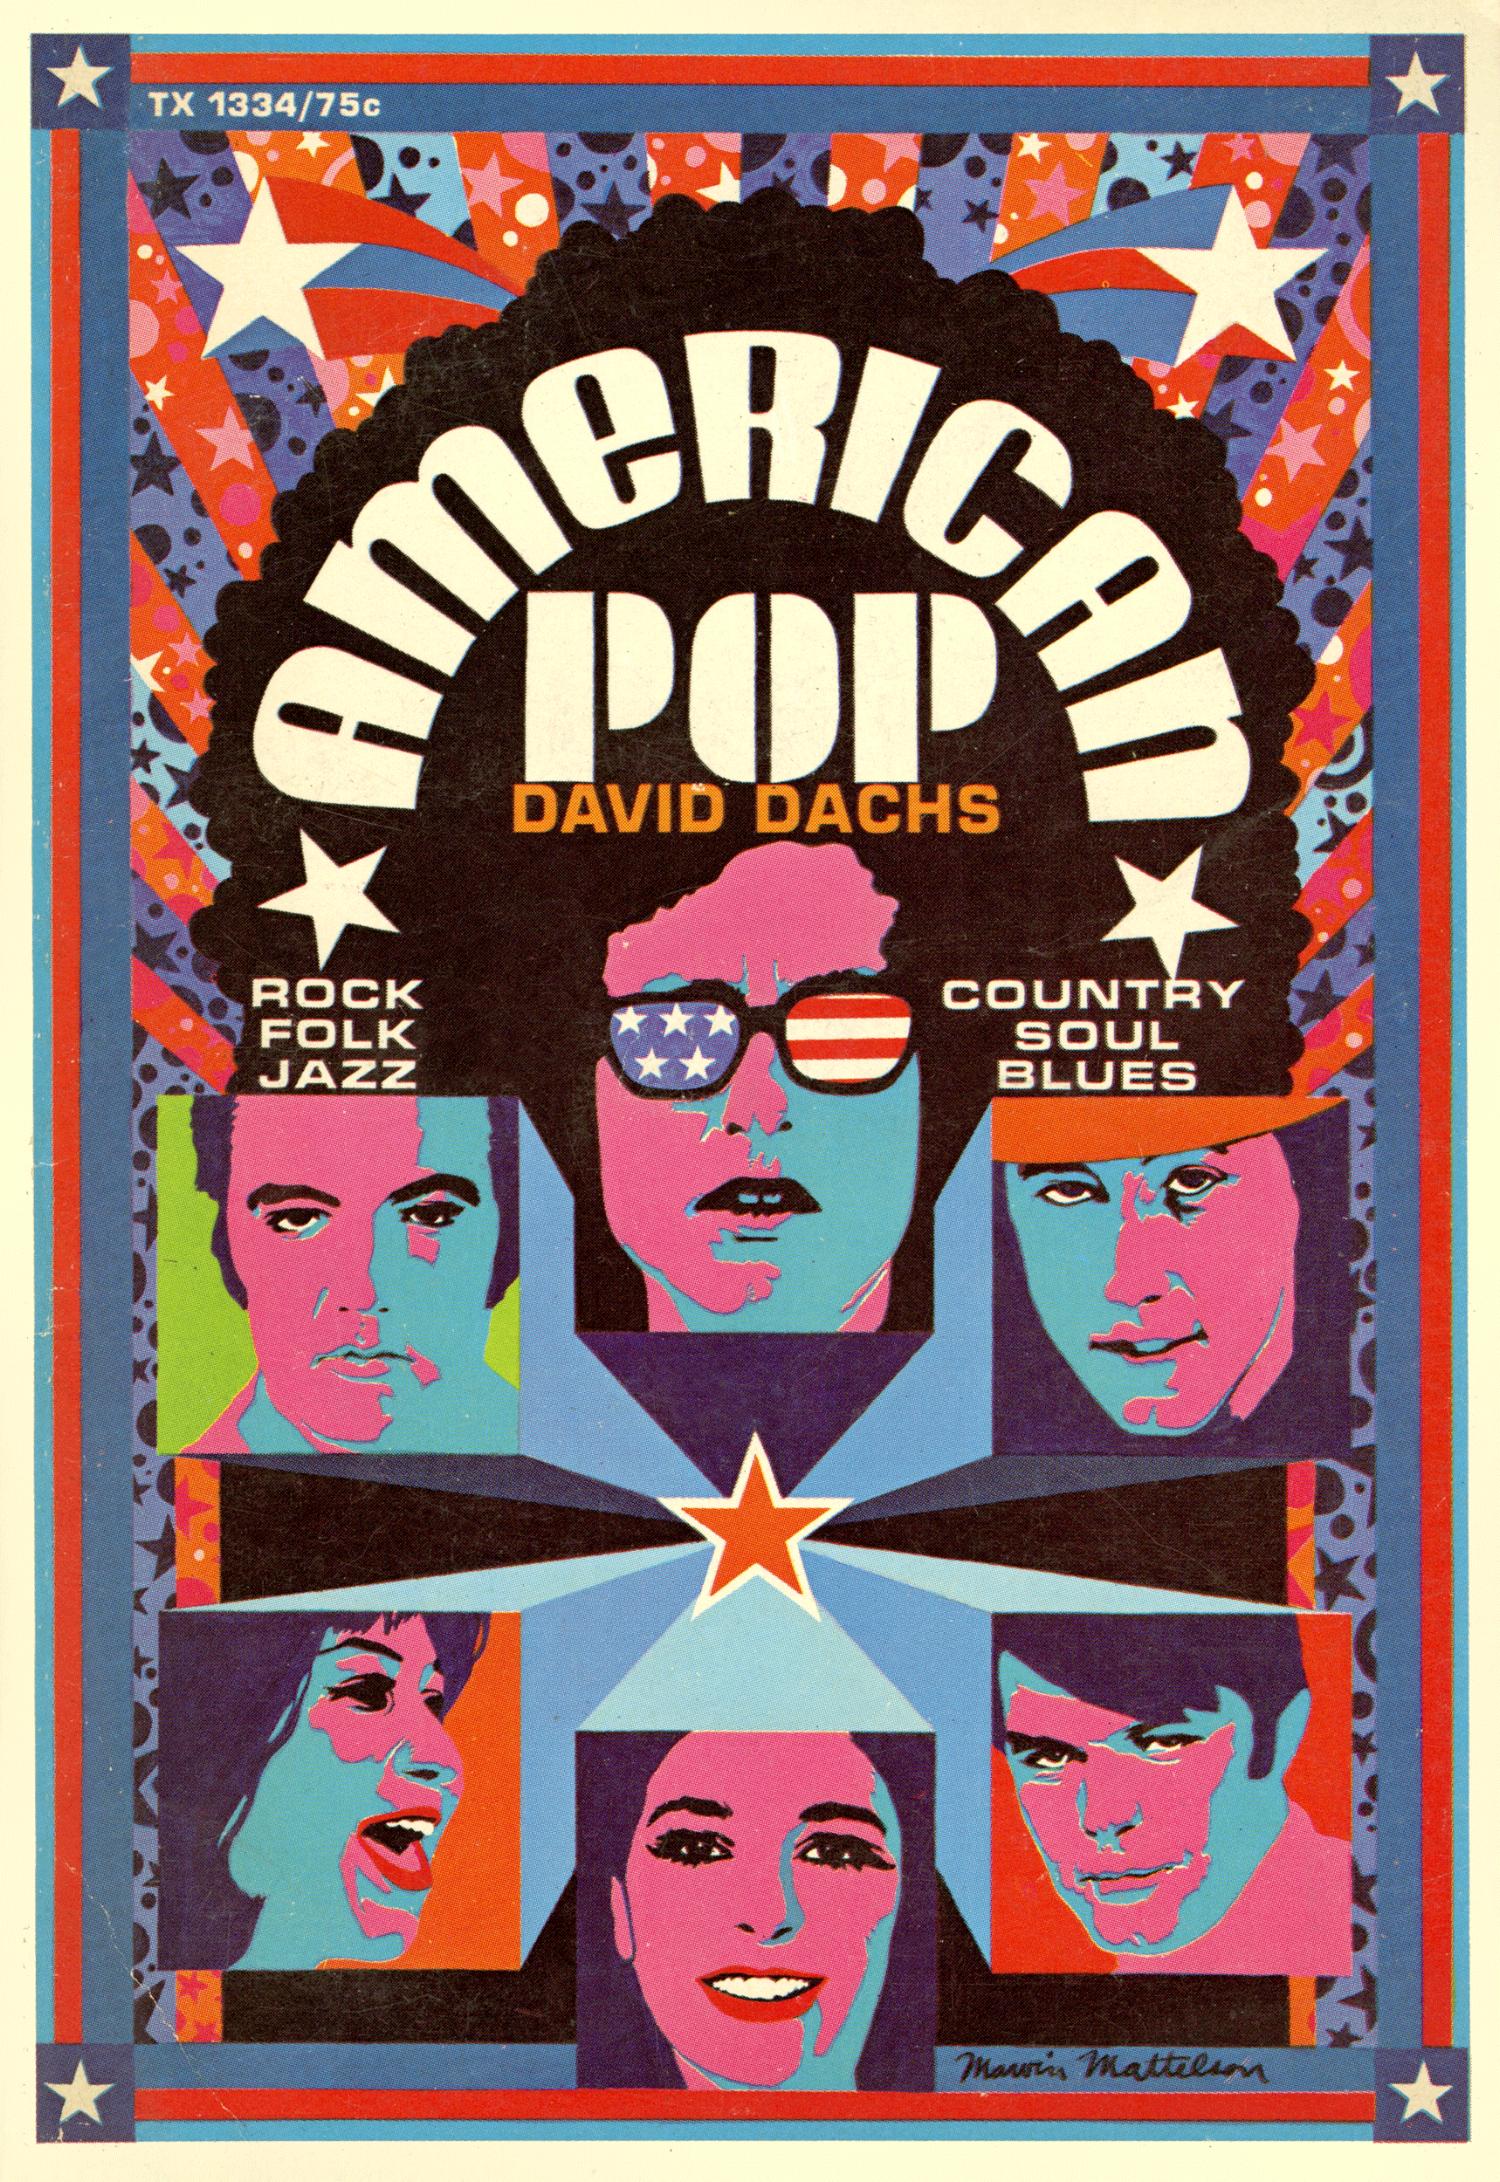 American Pop Paperback. 1969